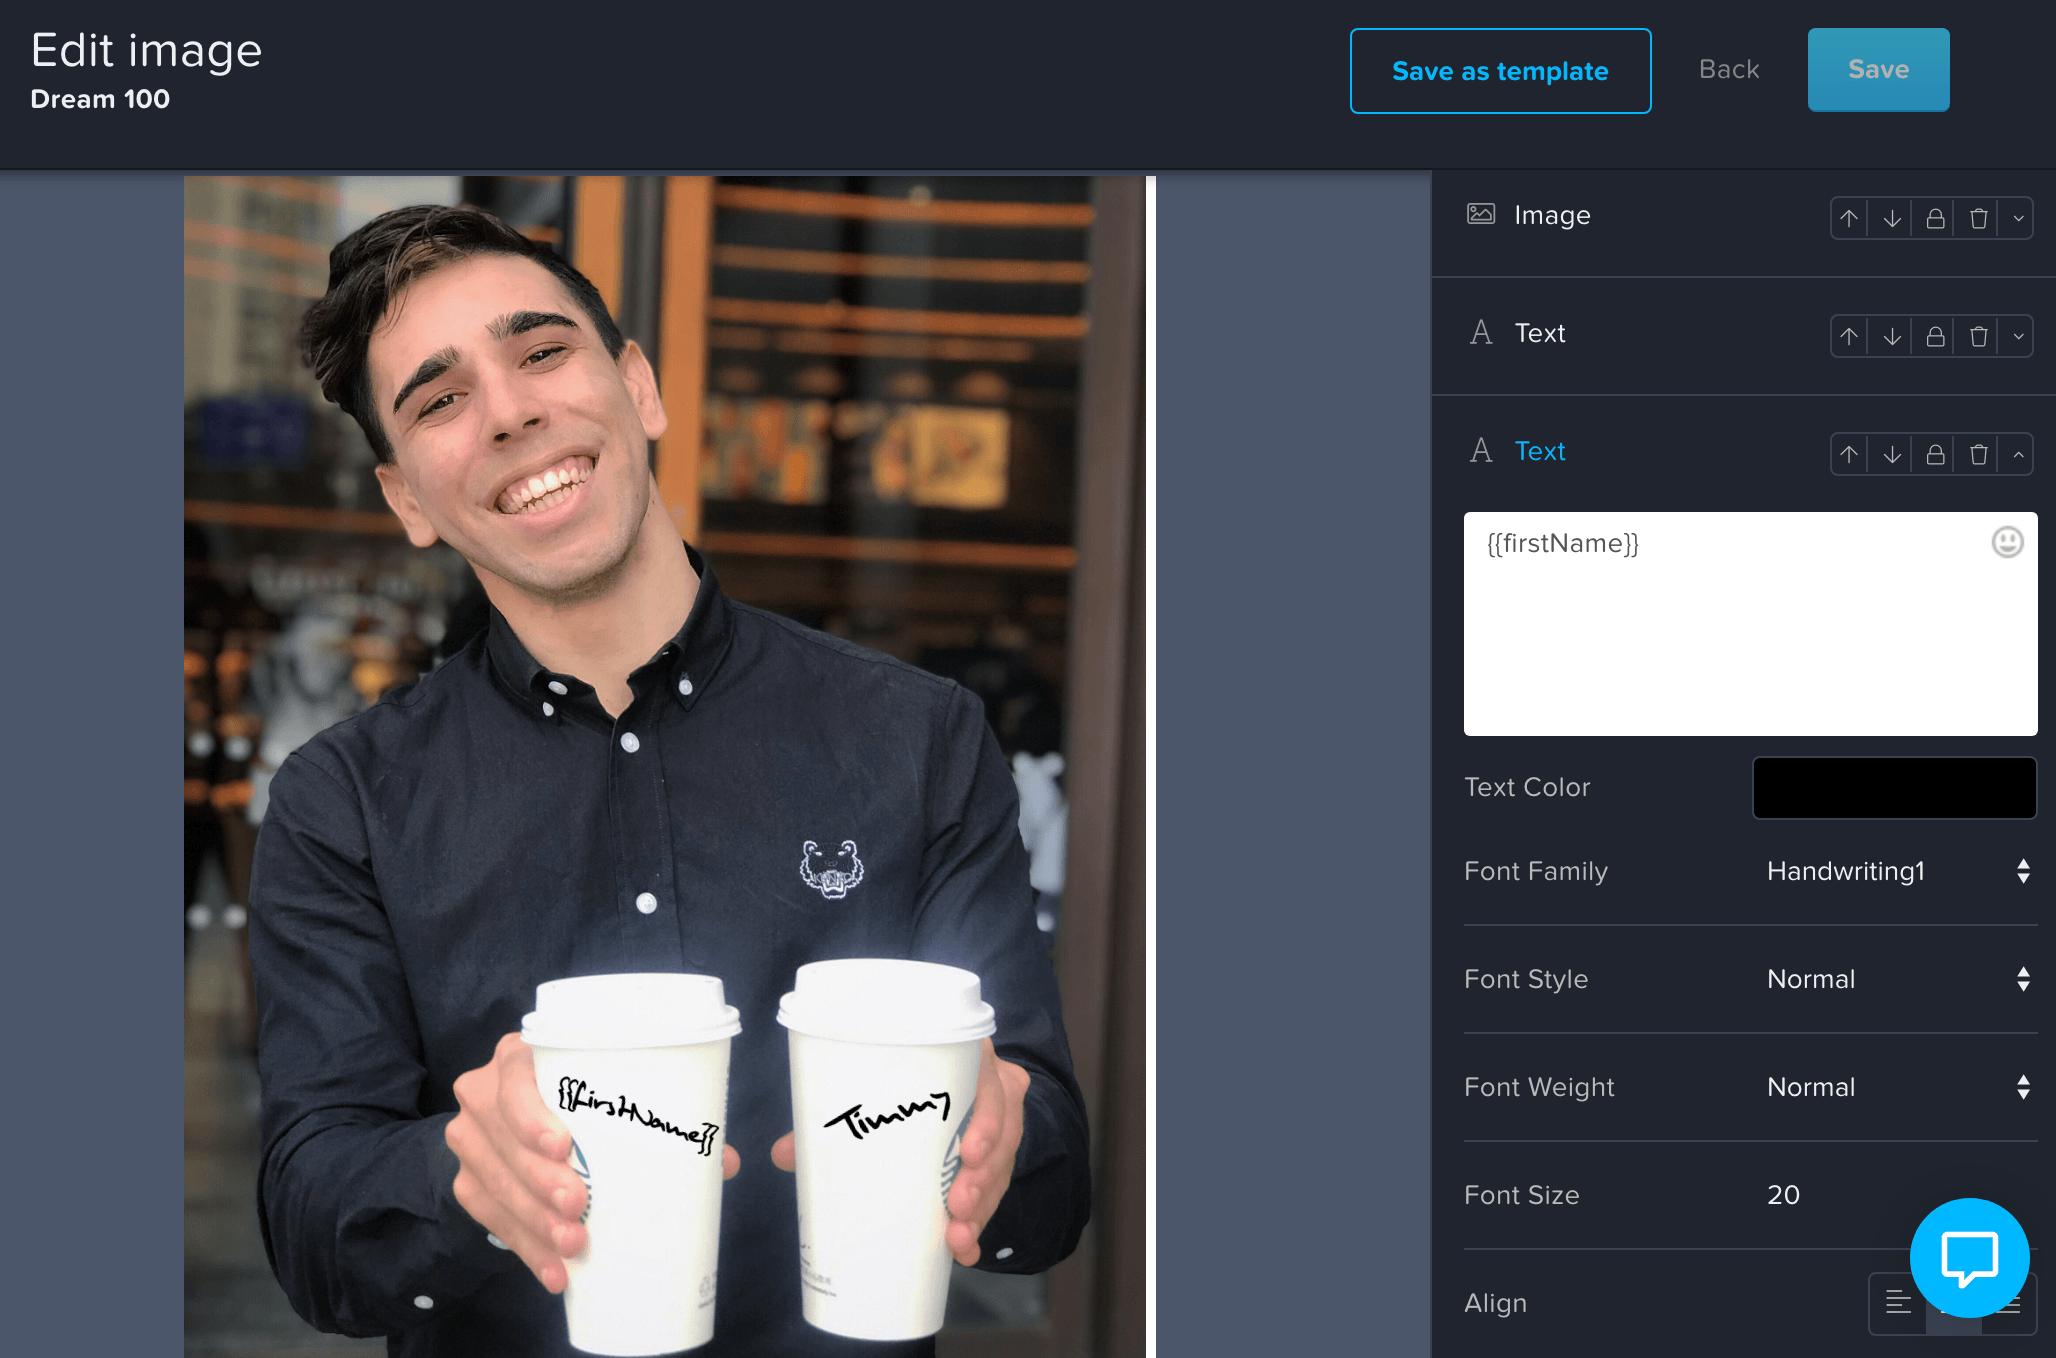 starbucks personalized image